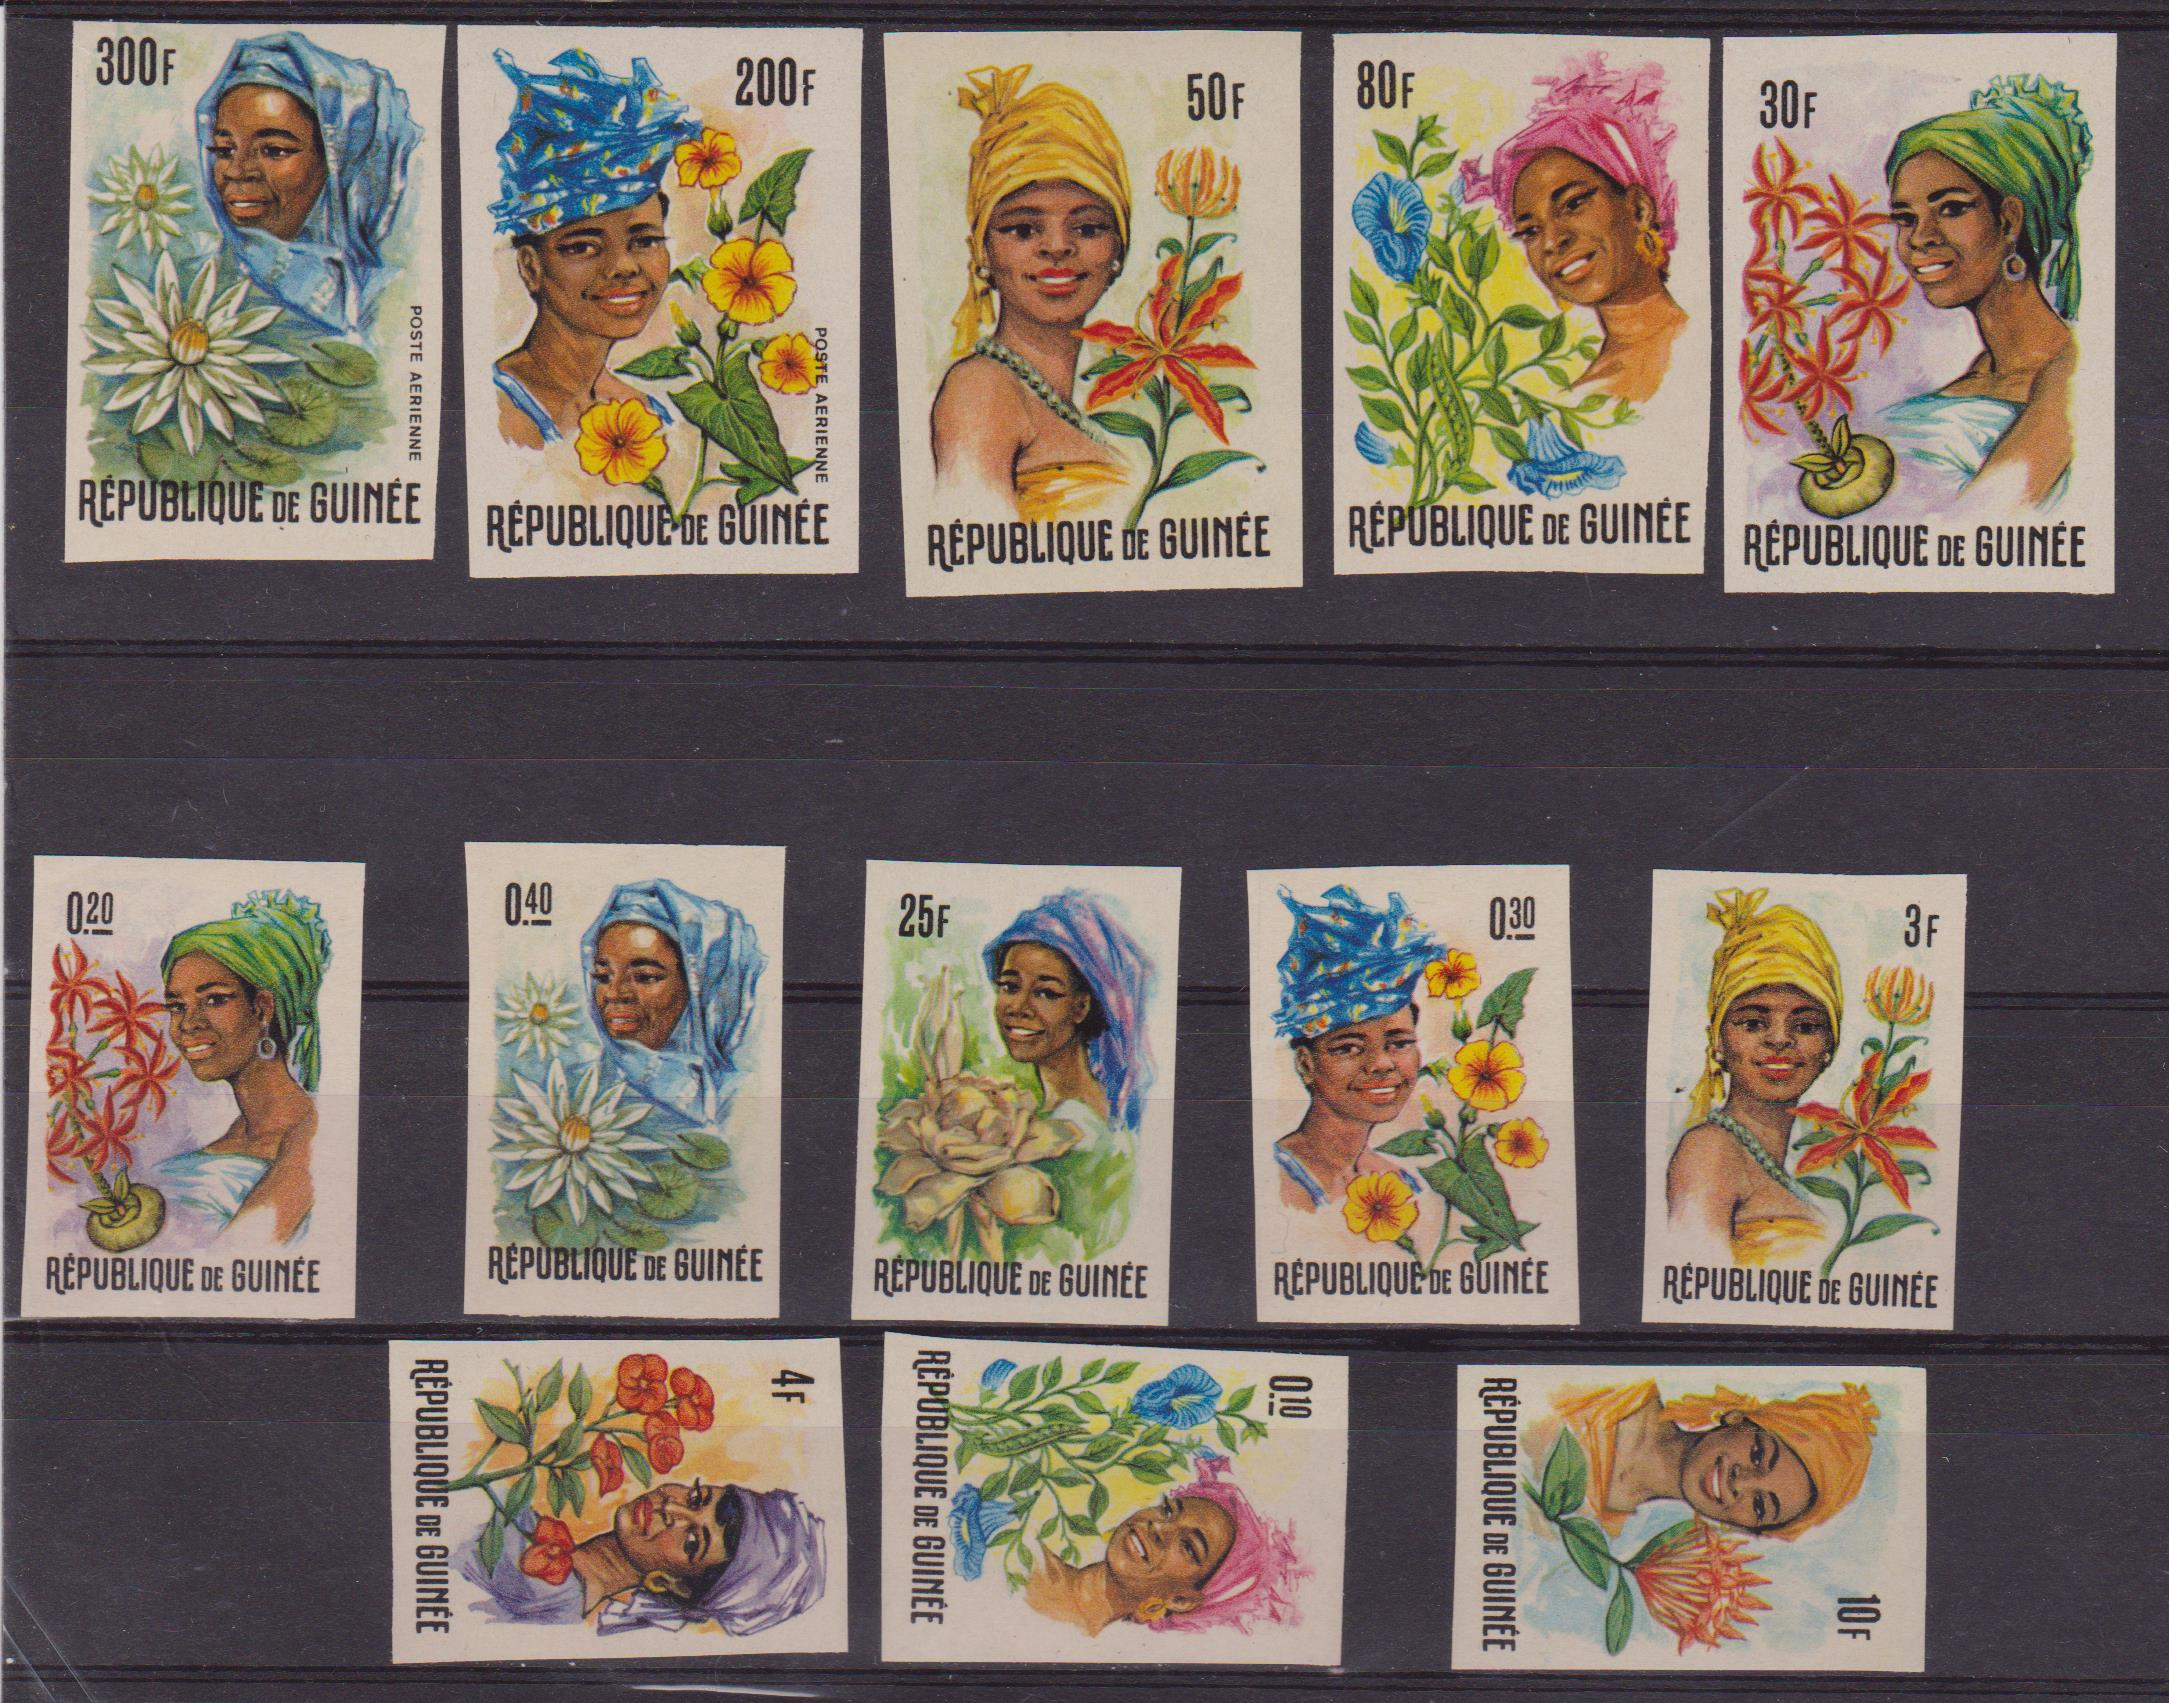 GUINEE 368-80 001